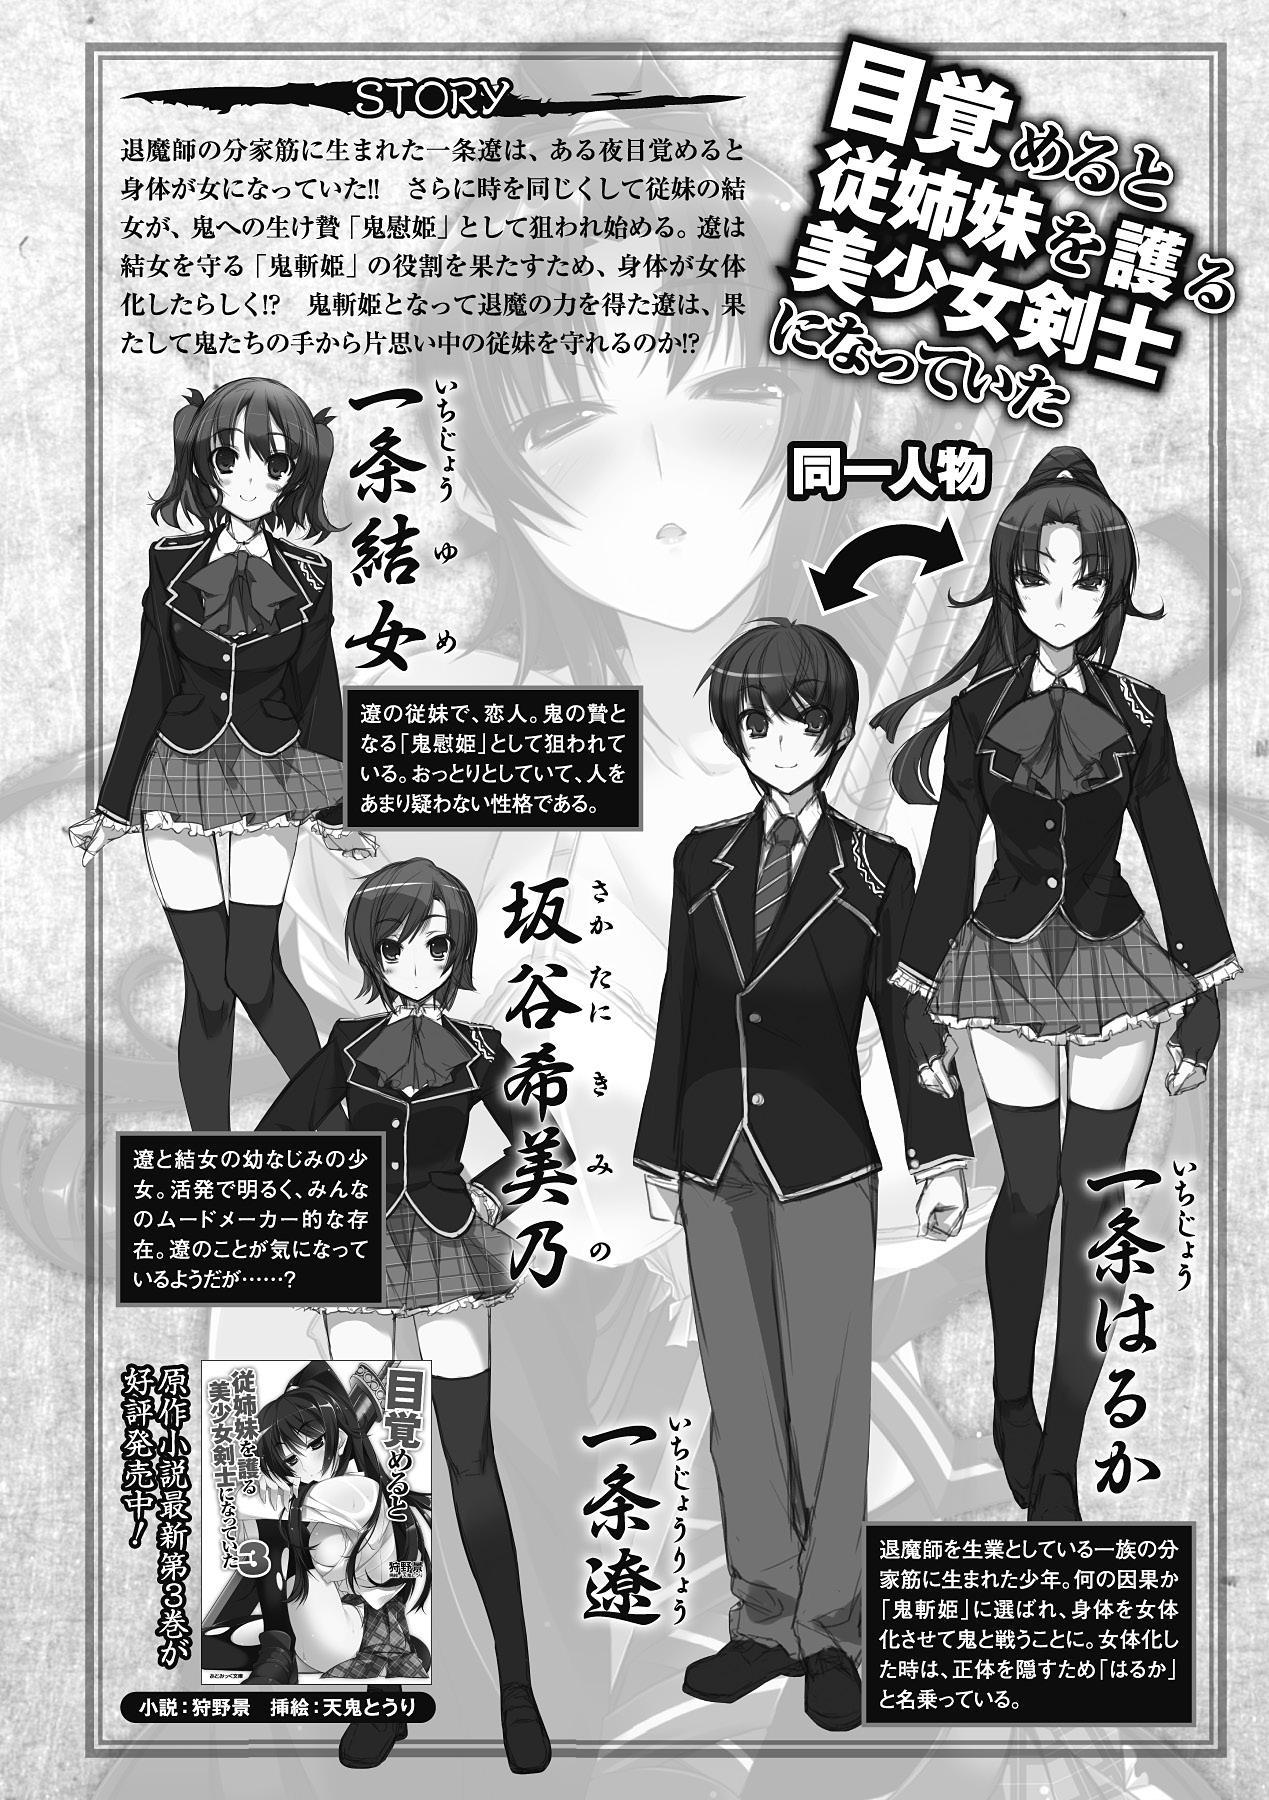 Megami Crisis 5 63